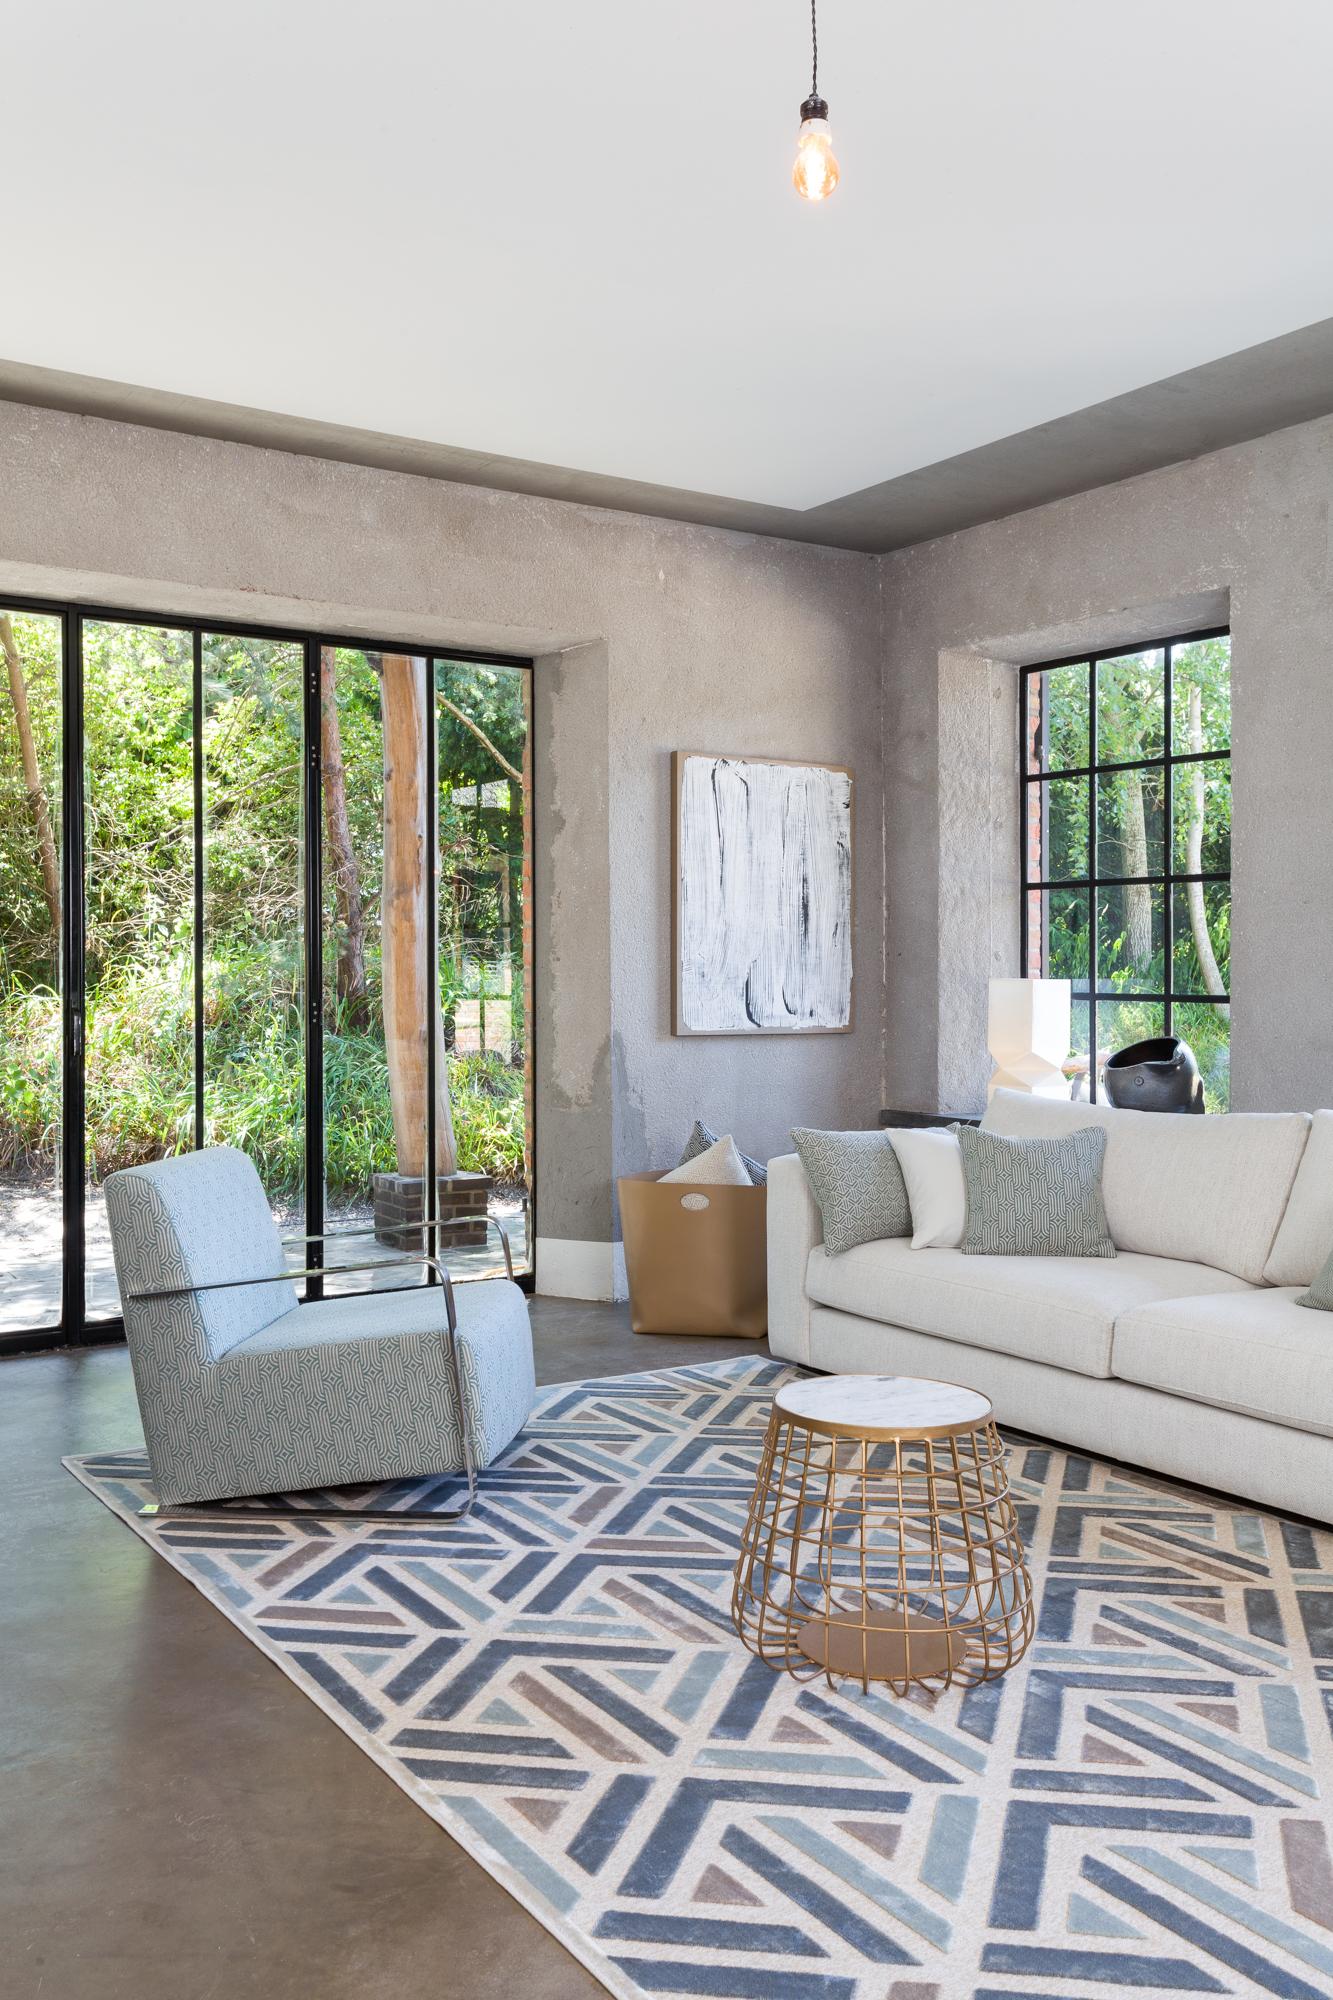 Horta Carpets